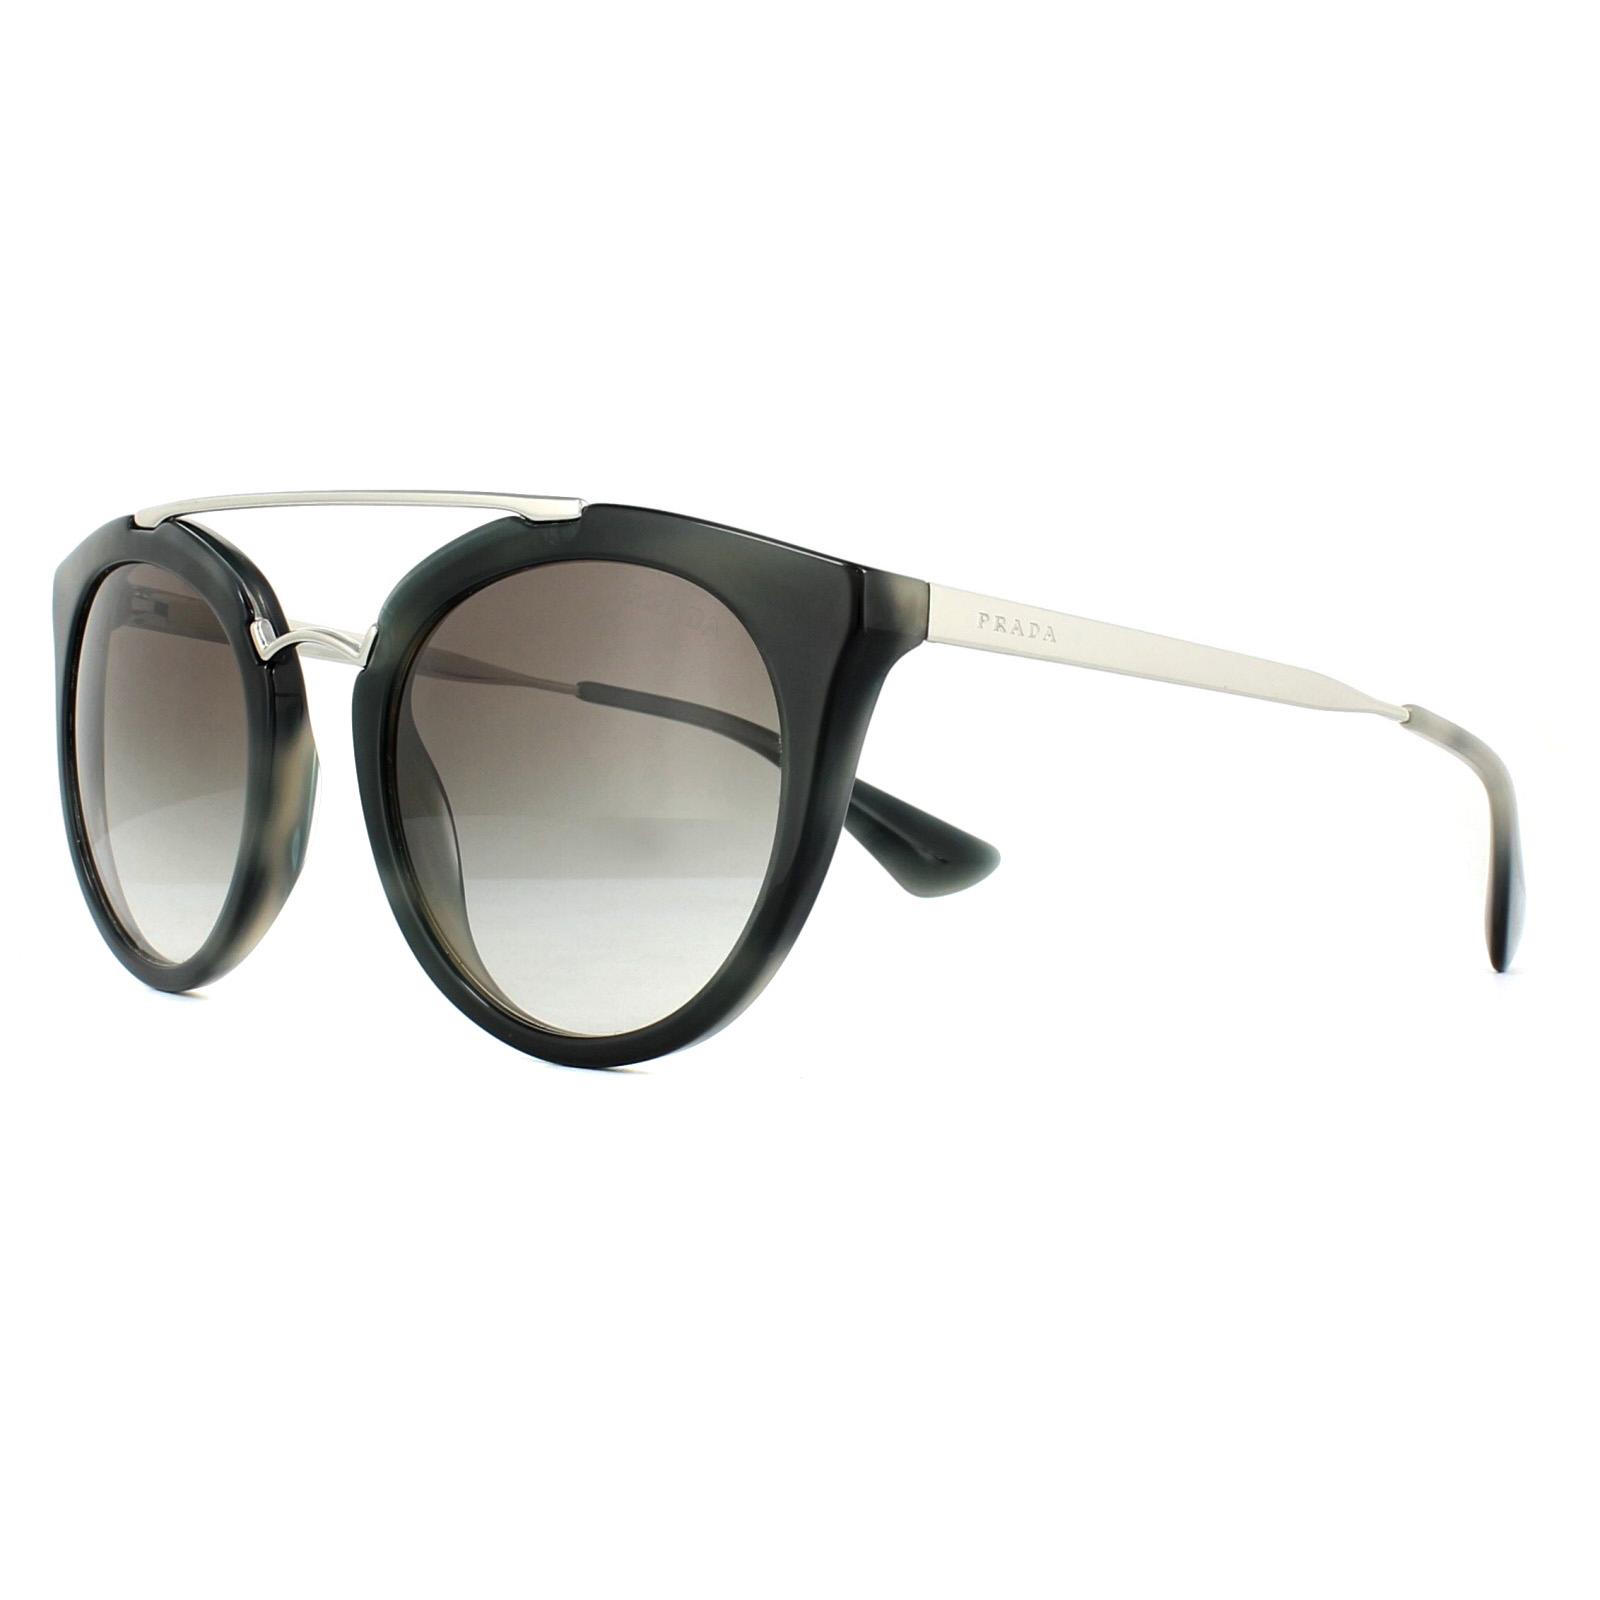 84c5ee40db Sentinel Prada Sunglasses PR 23SS USI0A7 Striped Grey Grey Gradient